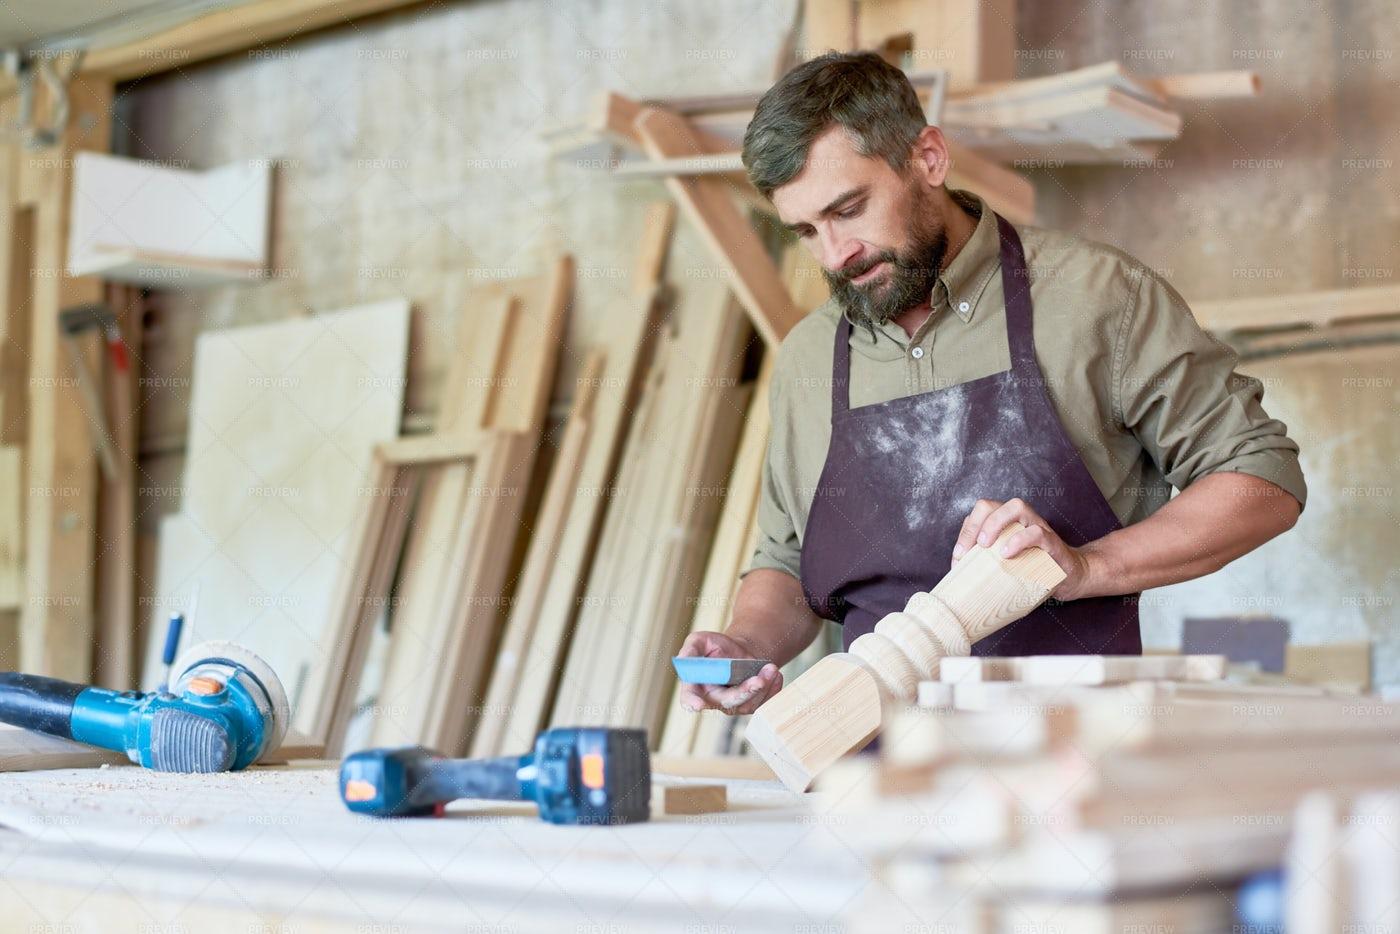 Bearded Carpenter Carving Stair...: Stock Photos